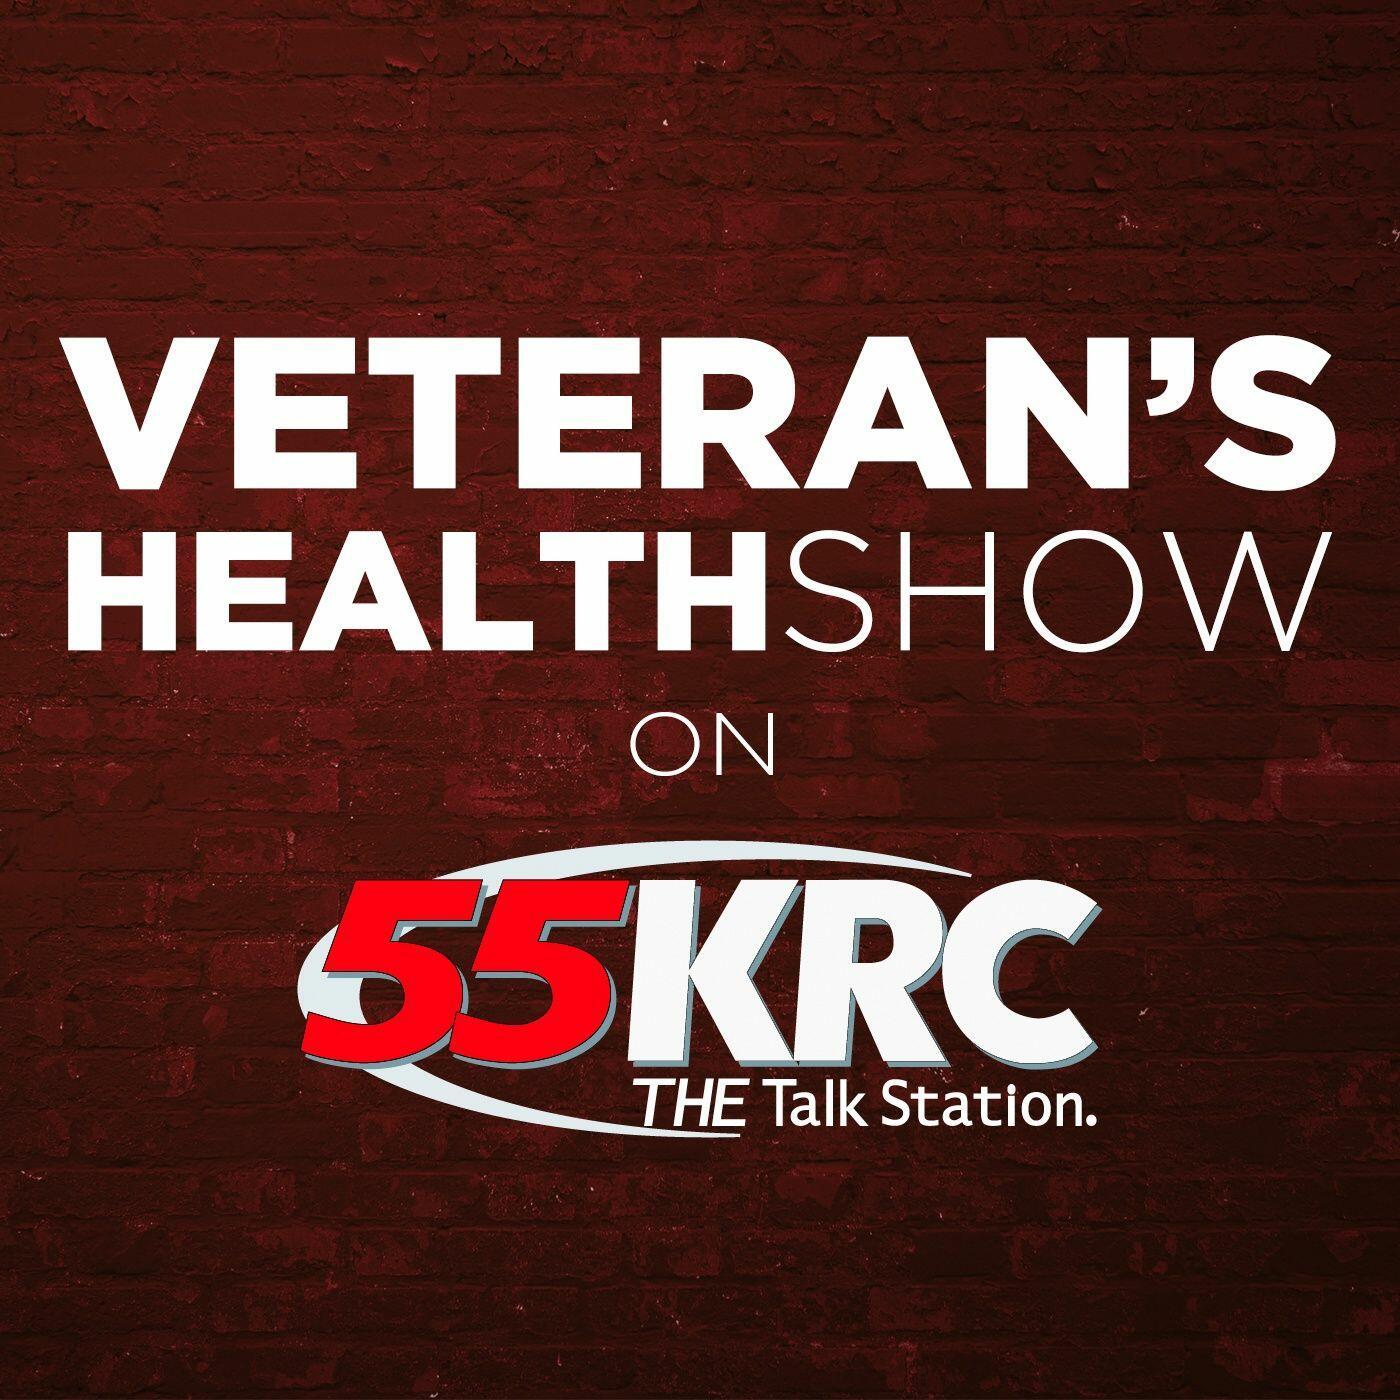 Veteran's Health Show